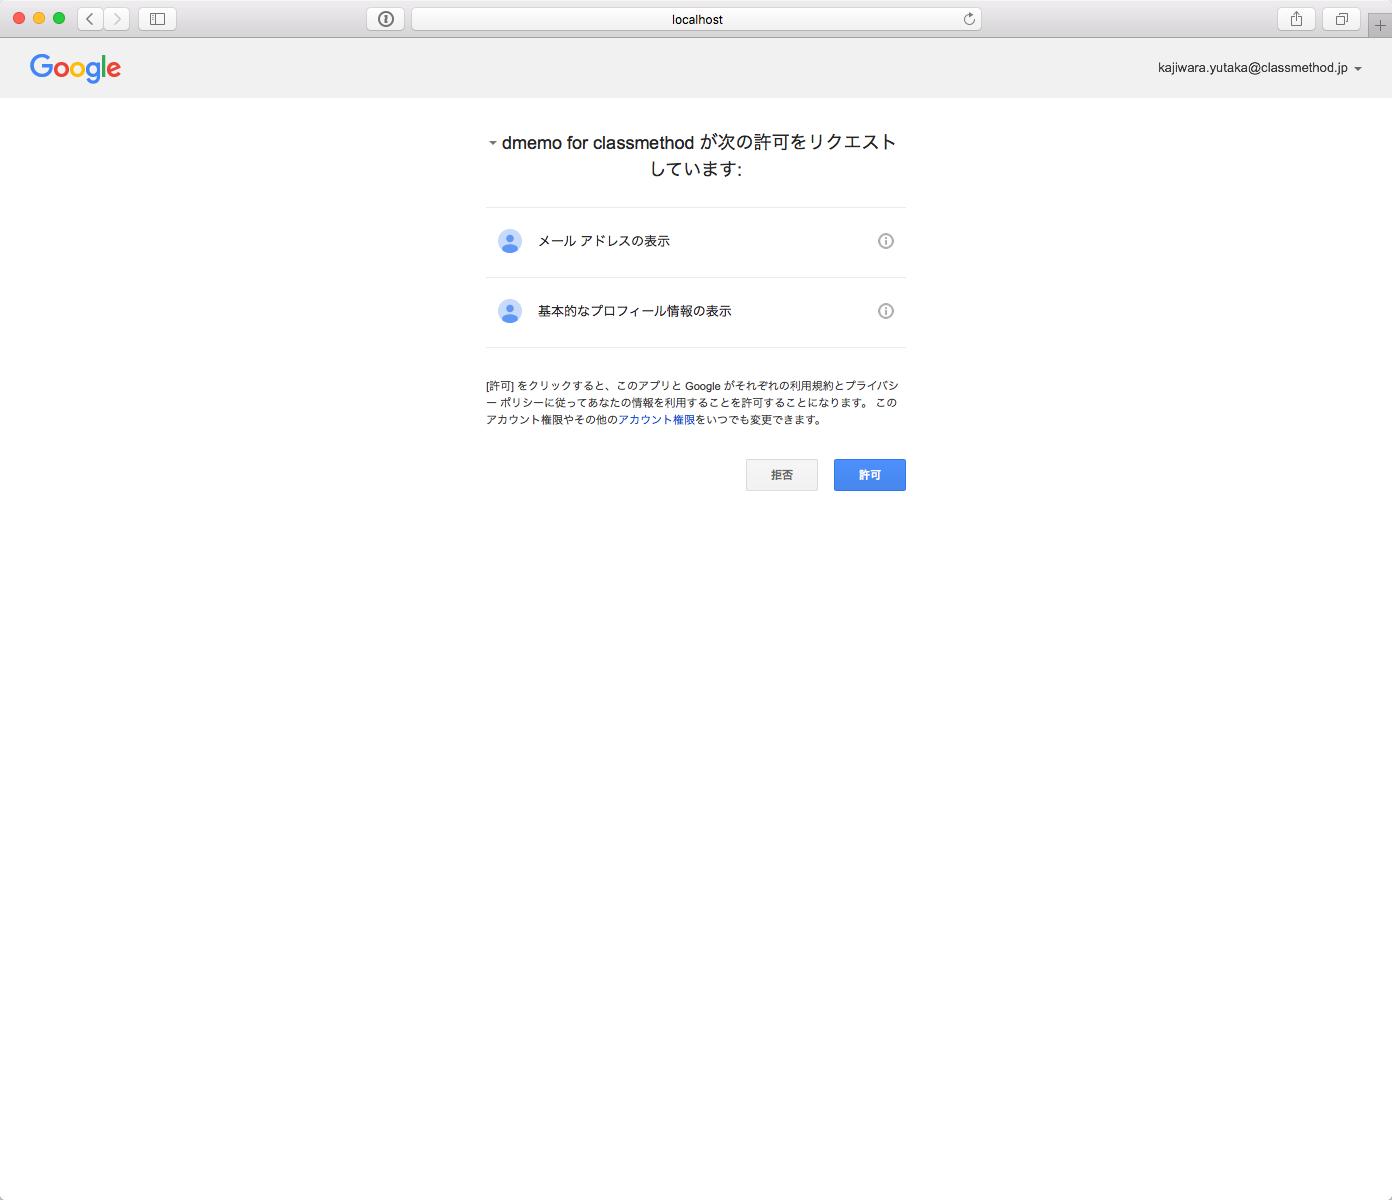 GoogleAPI_14